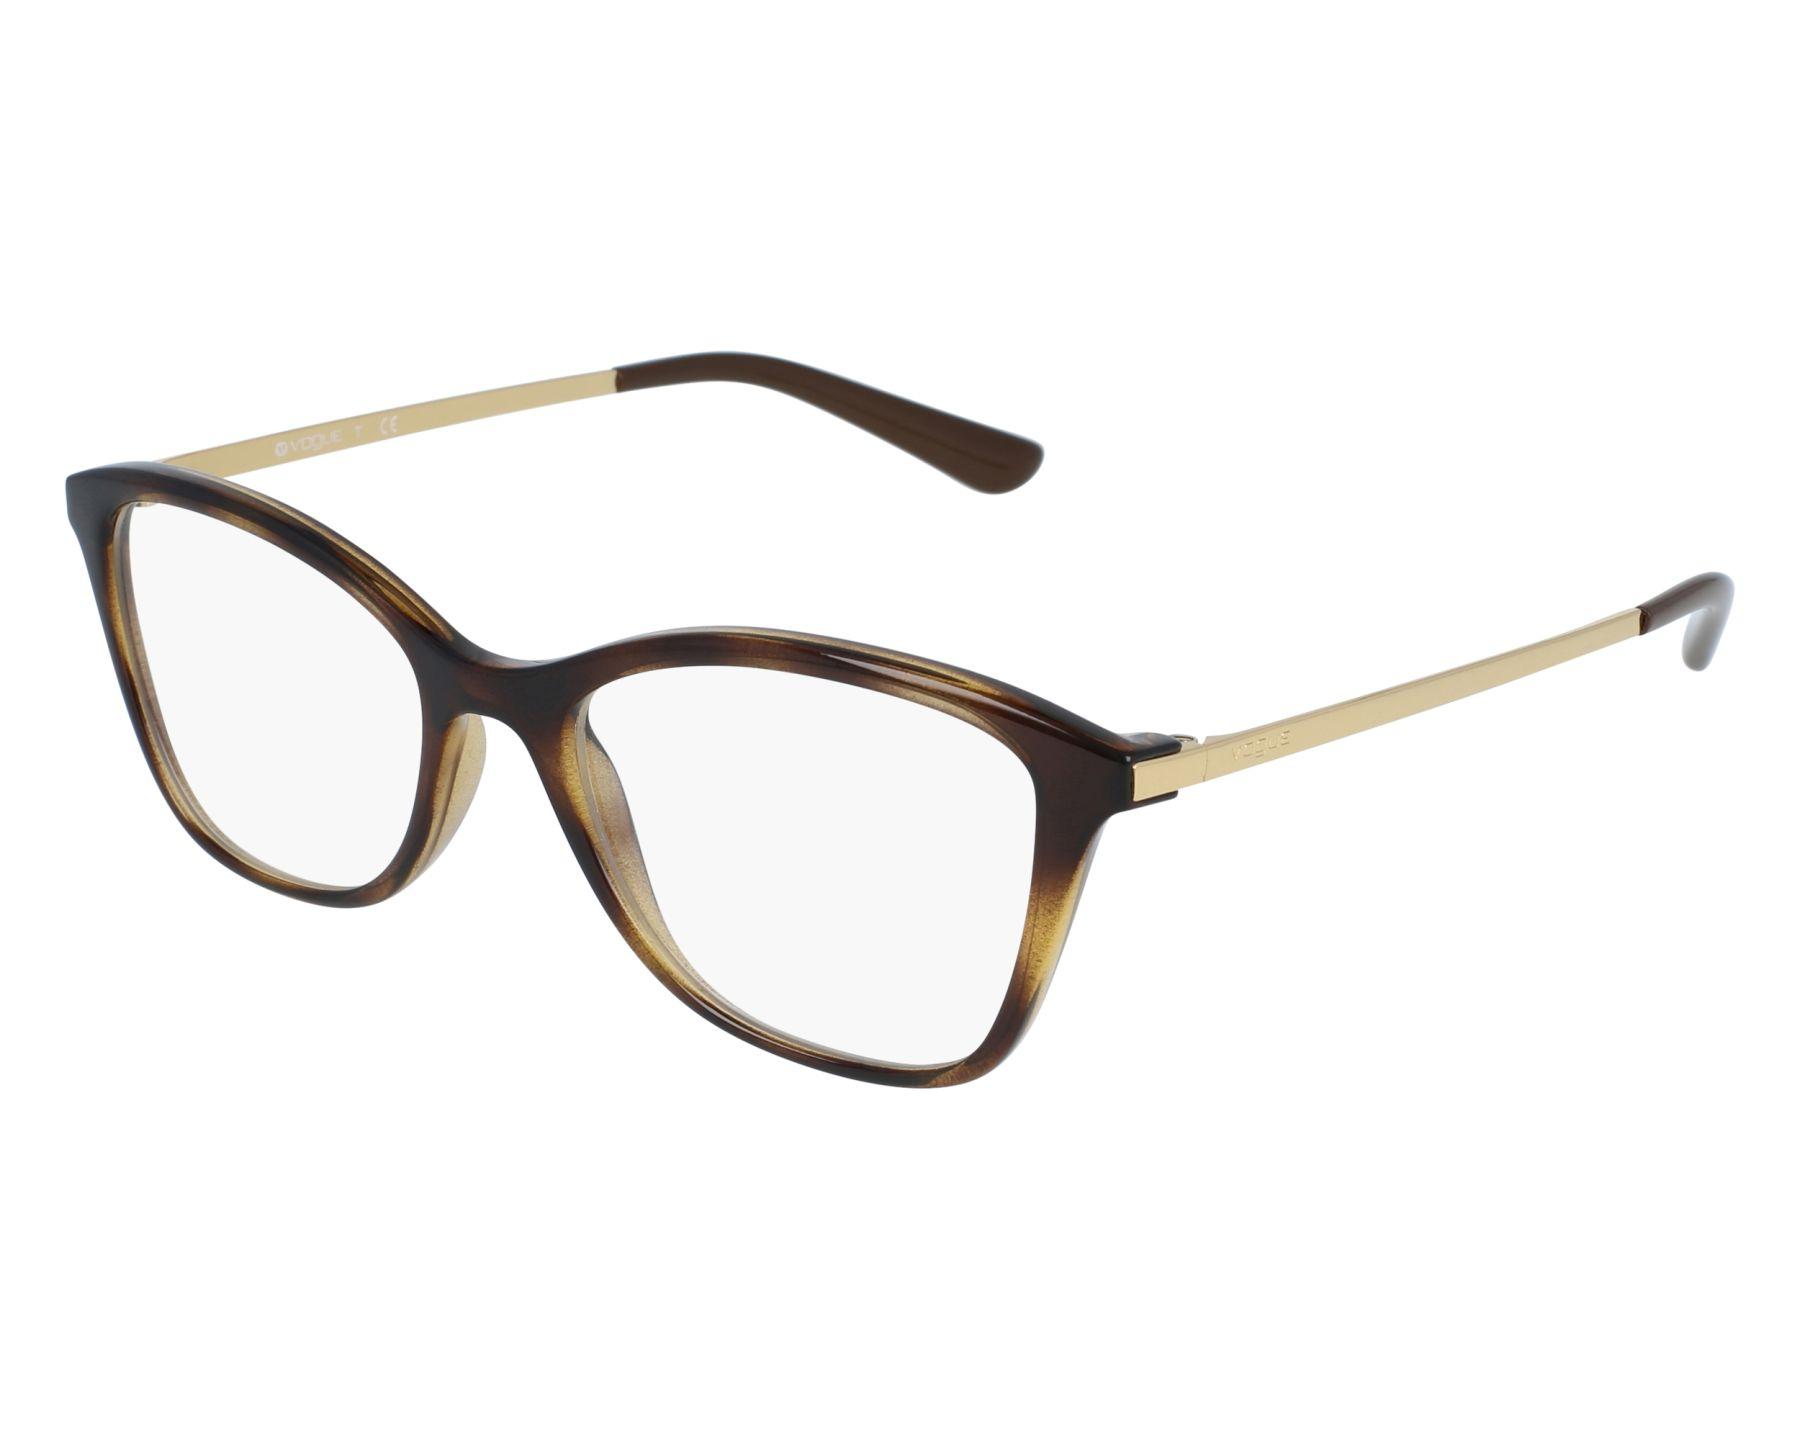 ce7154d706 Gafas Graduadas Vogue VO-5152 W656 - Havana Oro vista de frente